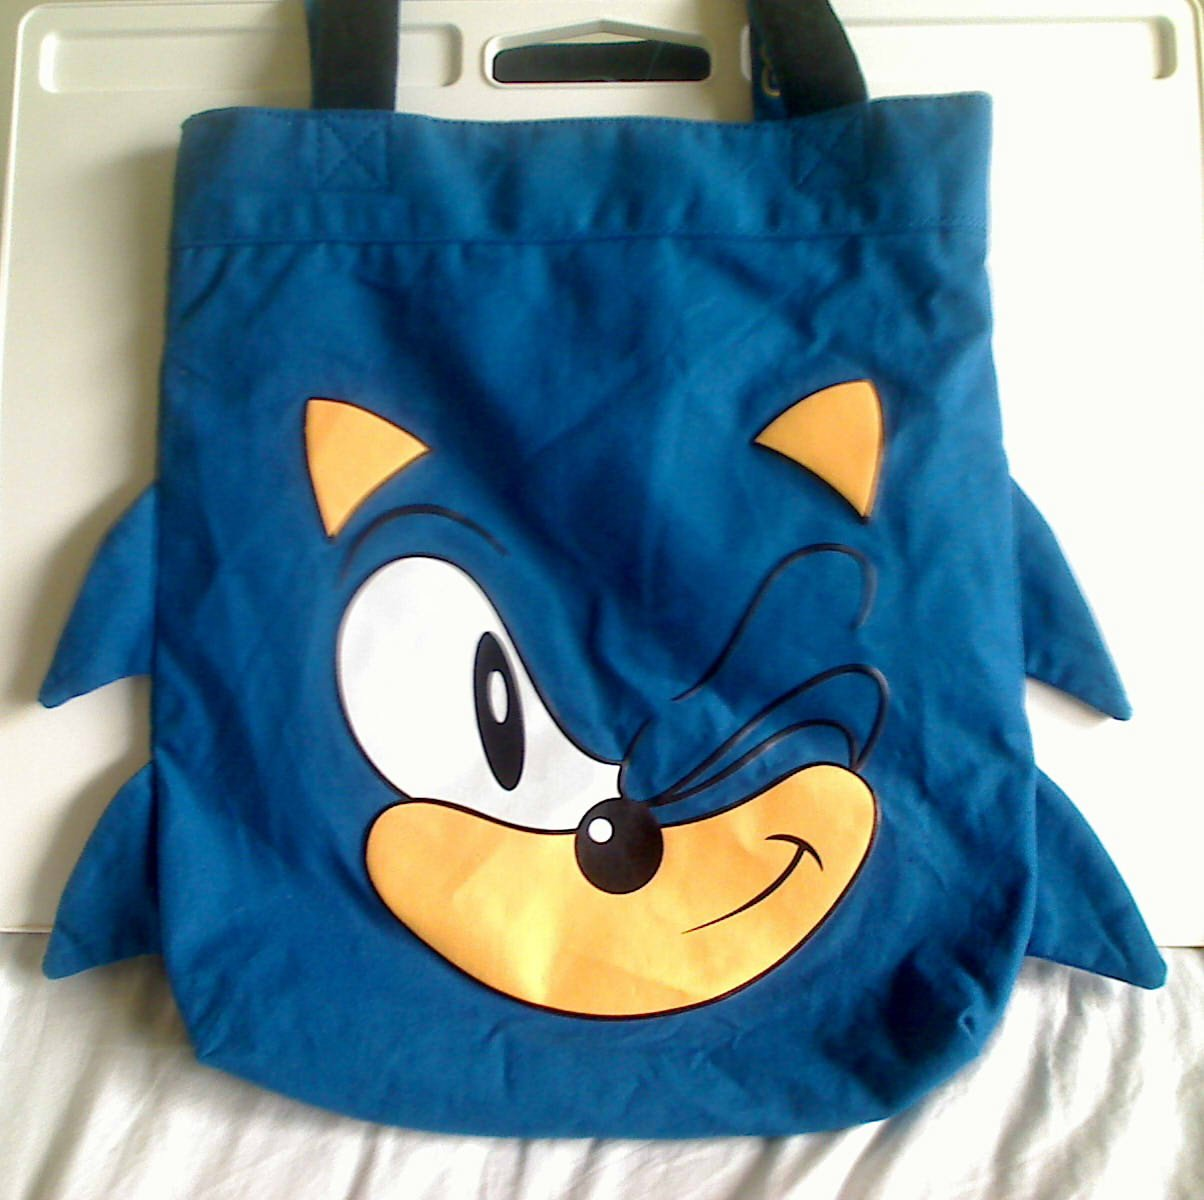 Classic SEGA Sonic the Hedgehog Blue Bag